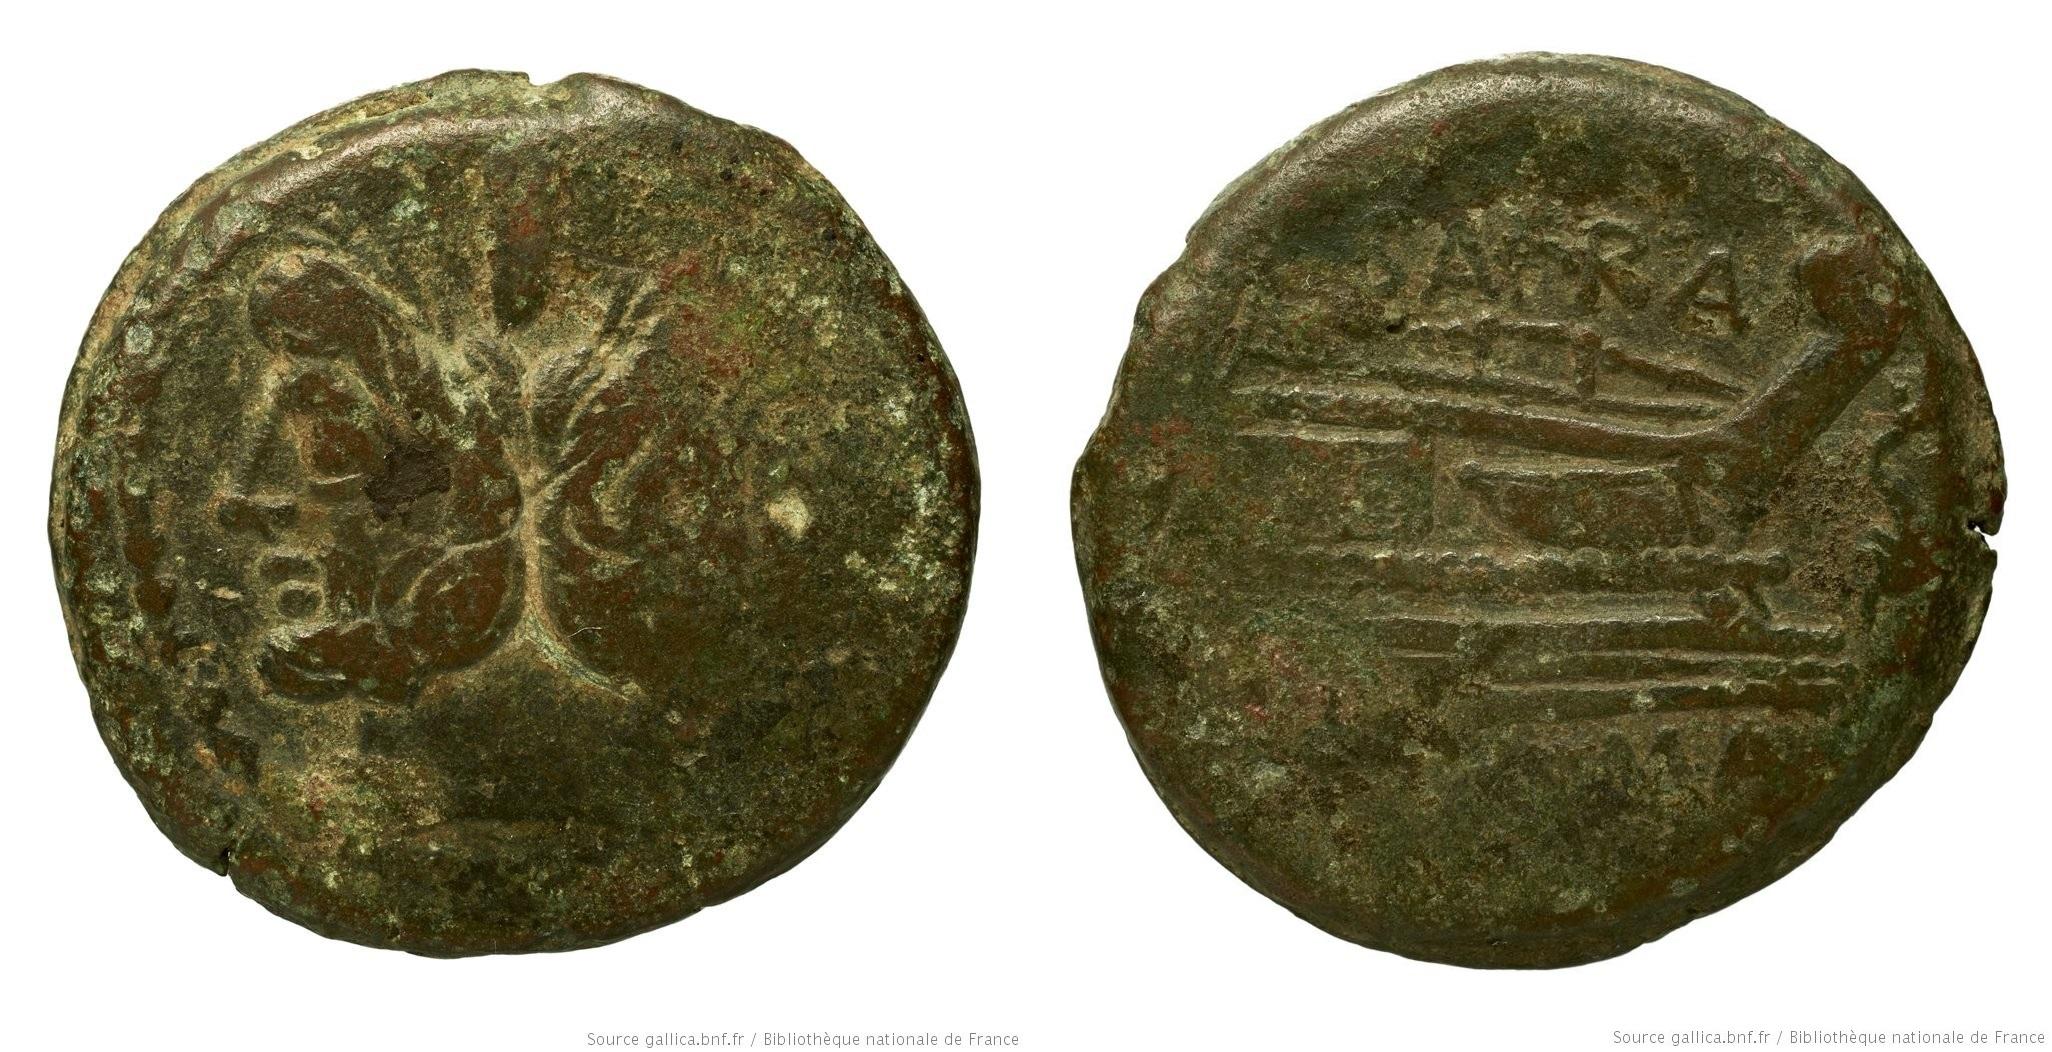 841AF – As Afrania – Spurius Afranius